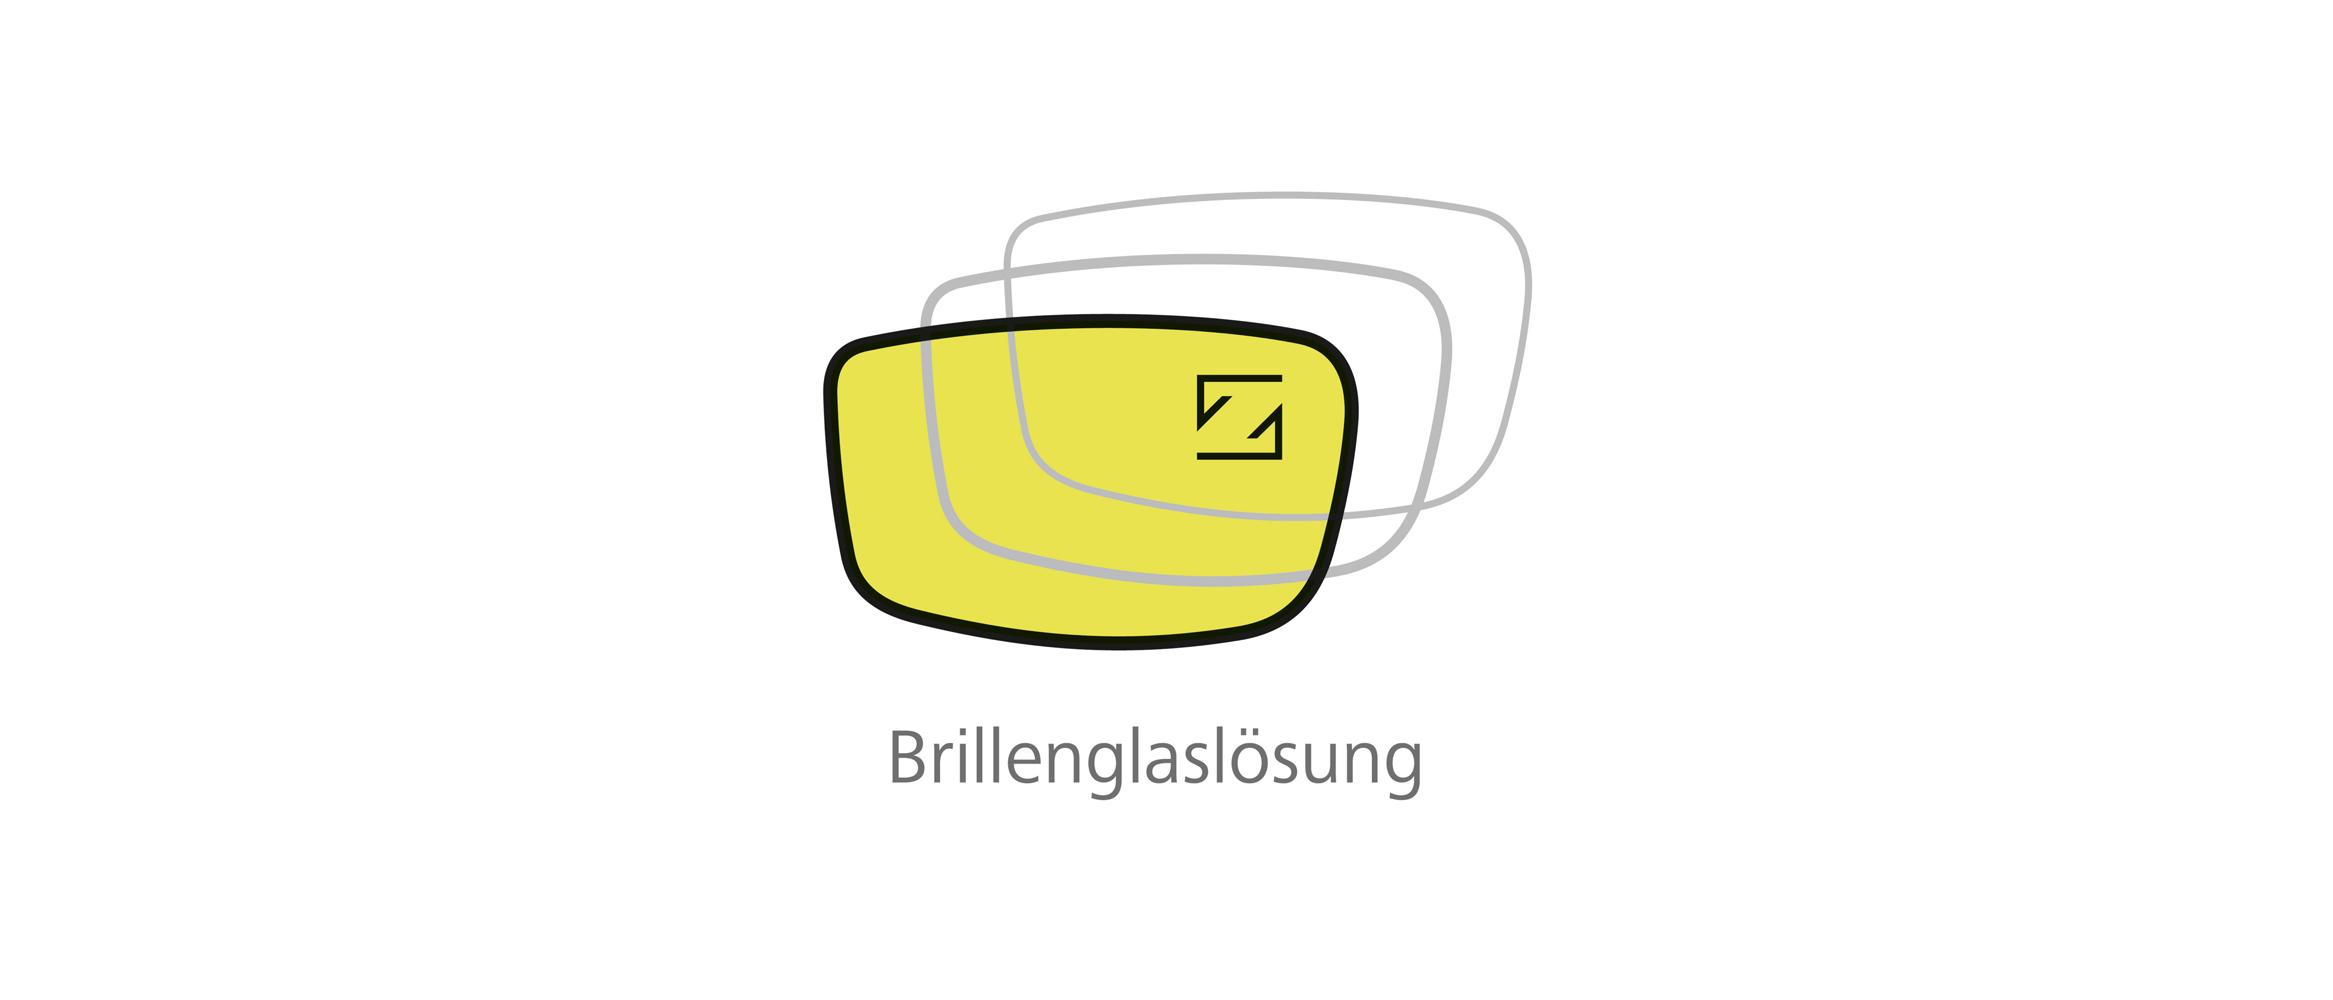 Brillenglaslösung